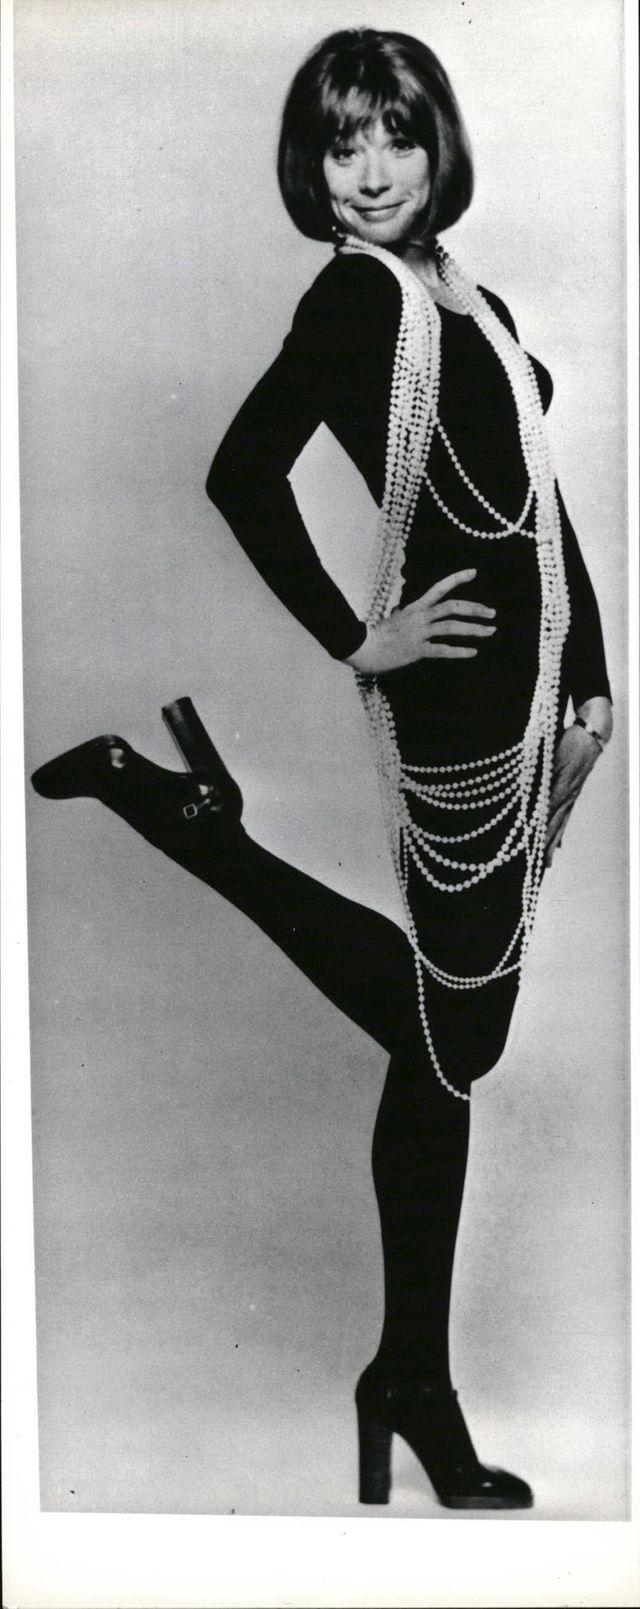 L'actrice américaine Shirley MacLaine (1960 - 1969)